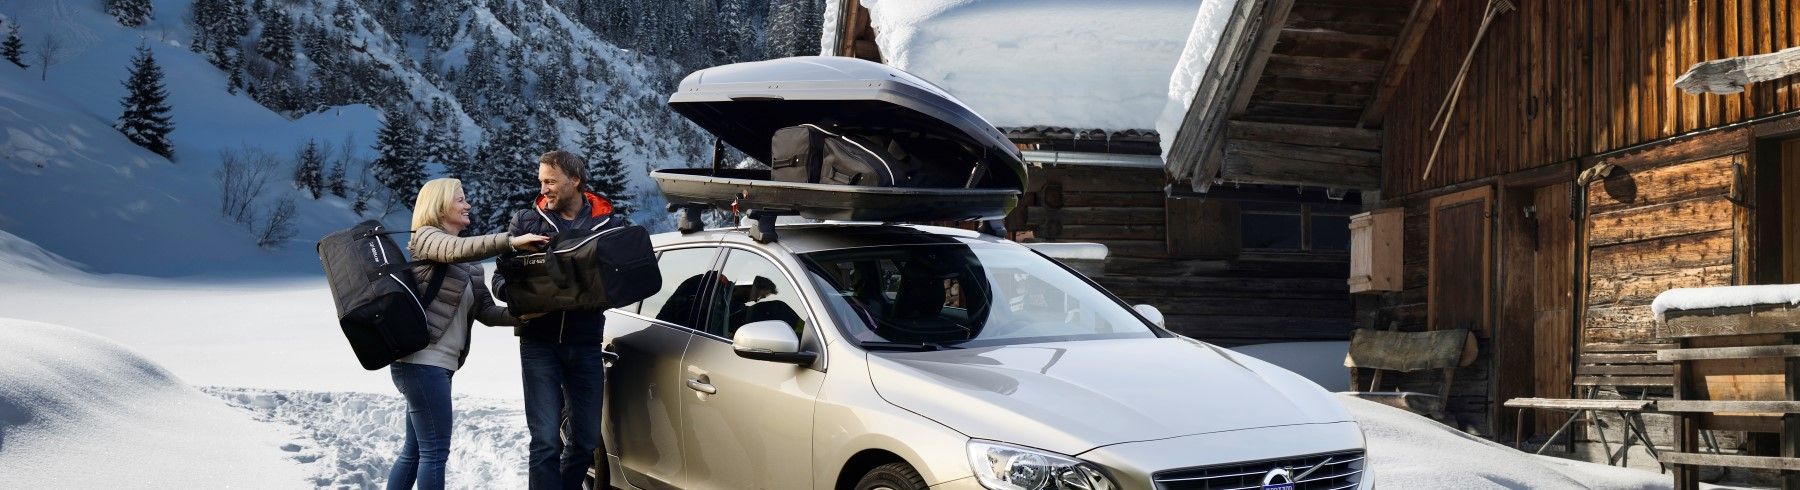 car-bags-roof-box-bags-unloading-winter